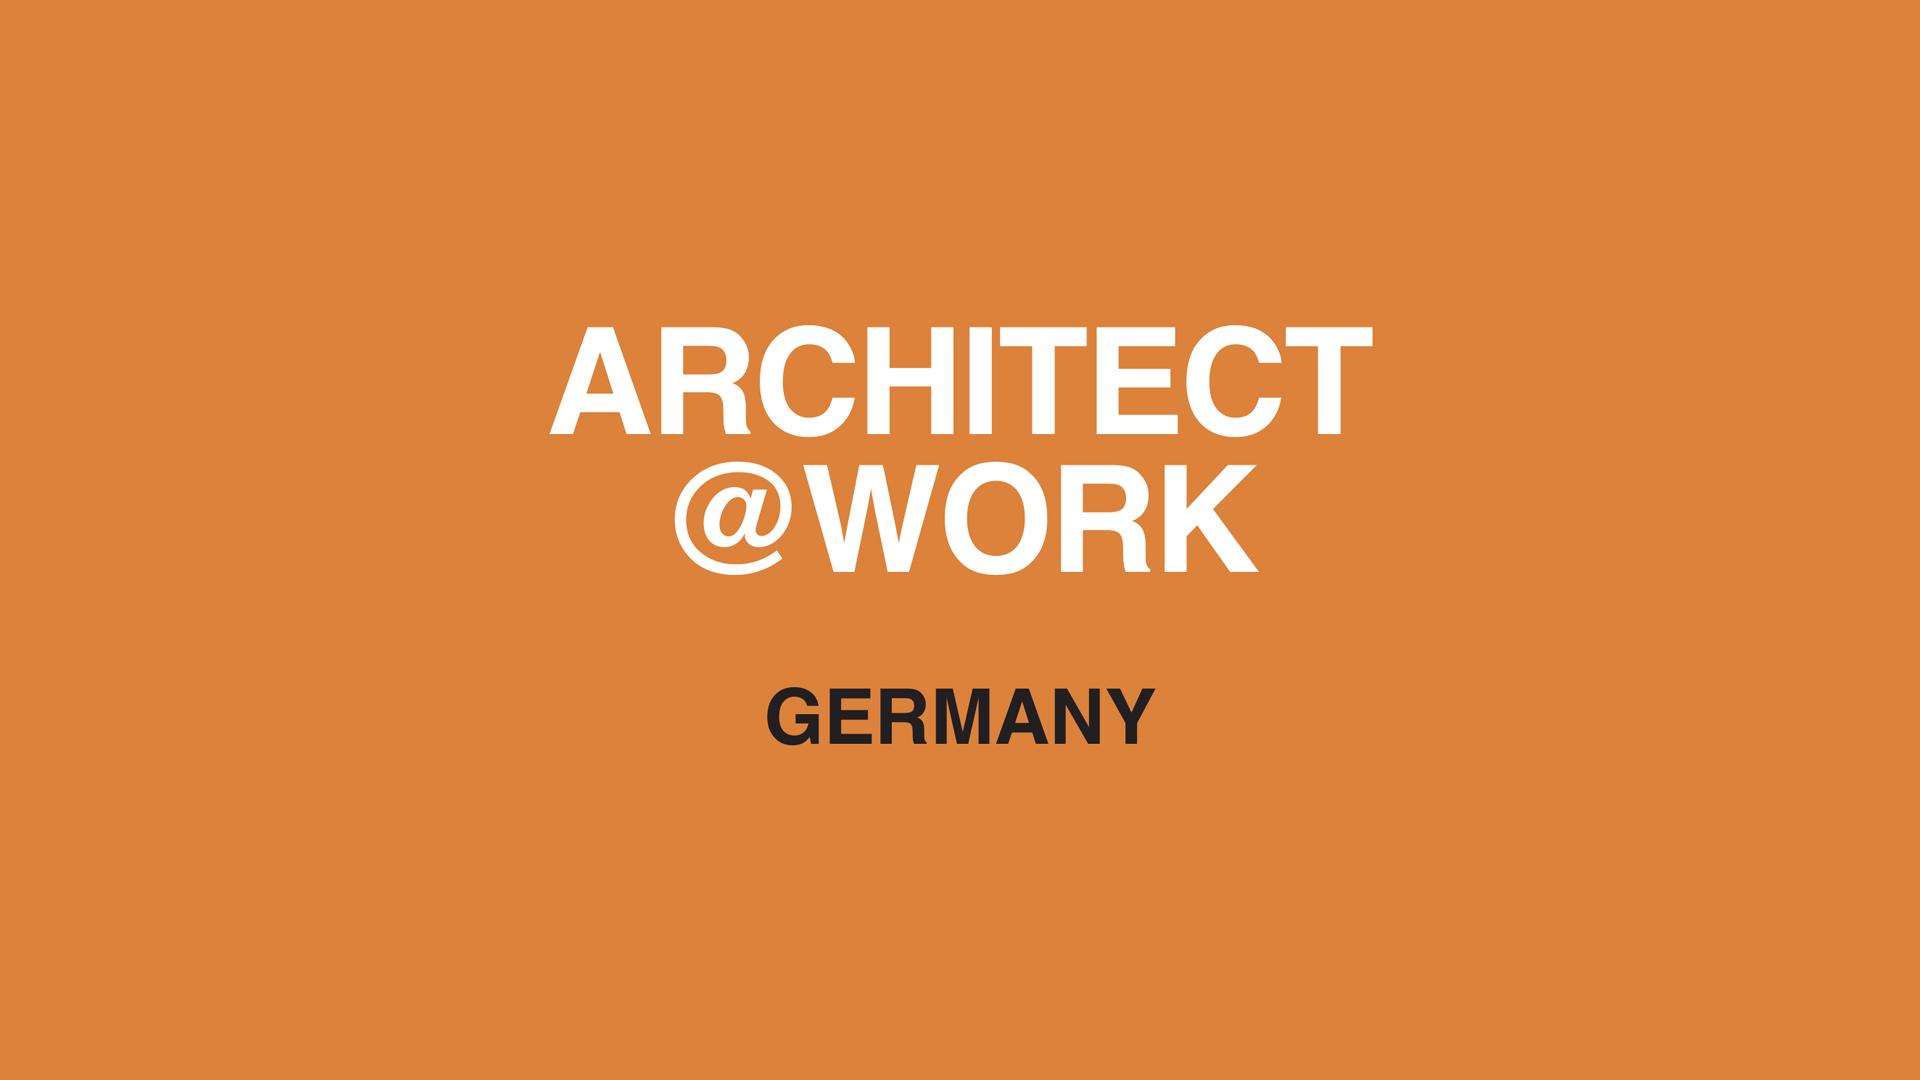 ARCHITECT@WORK GERMANY 2021